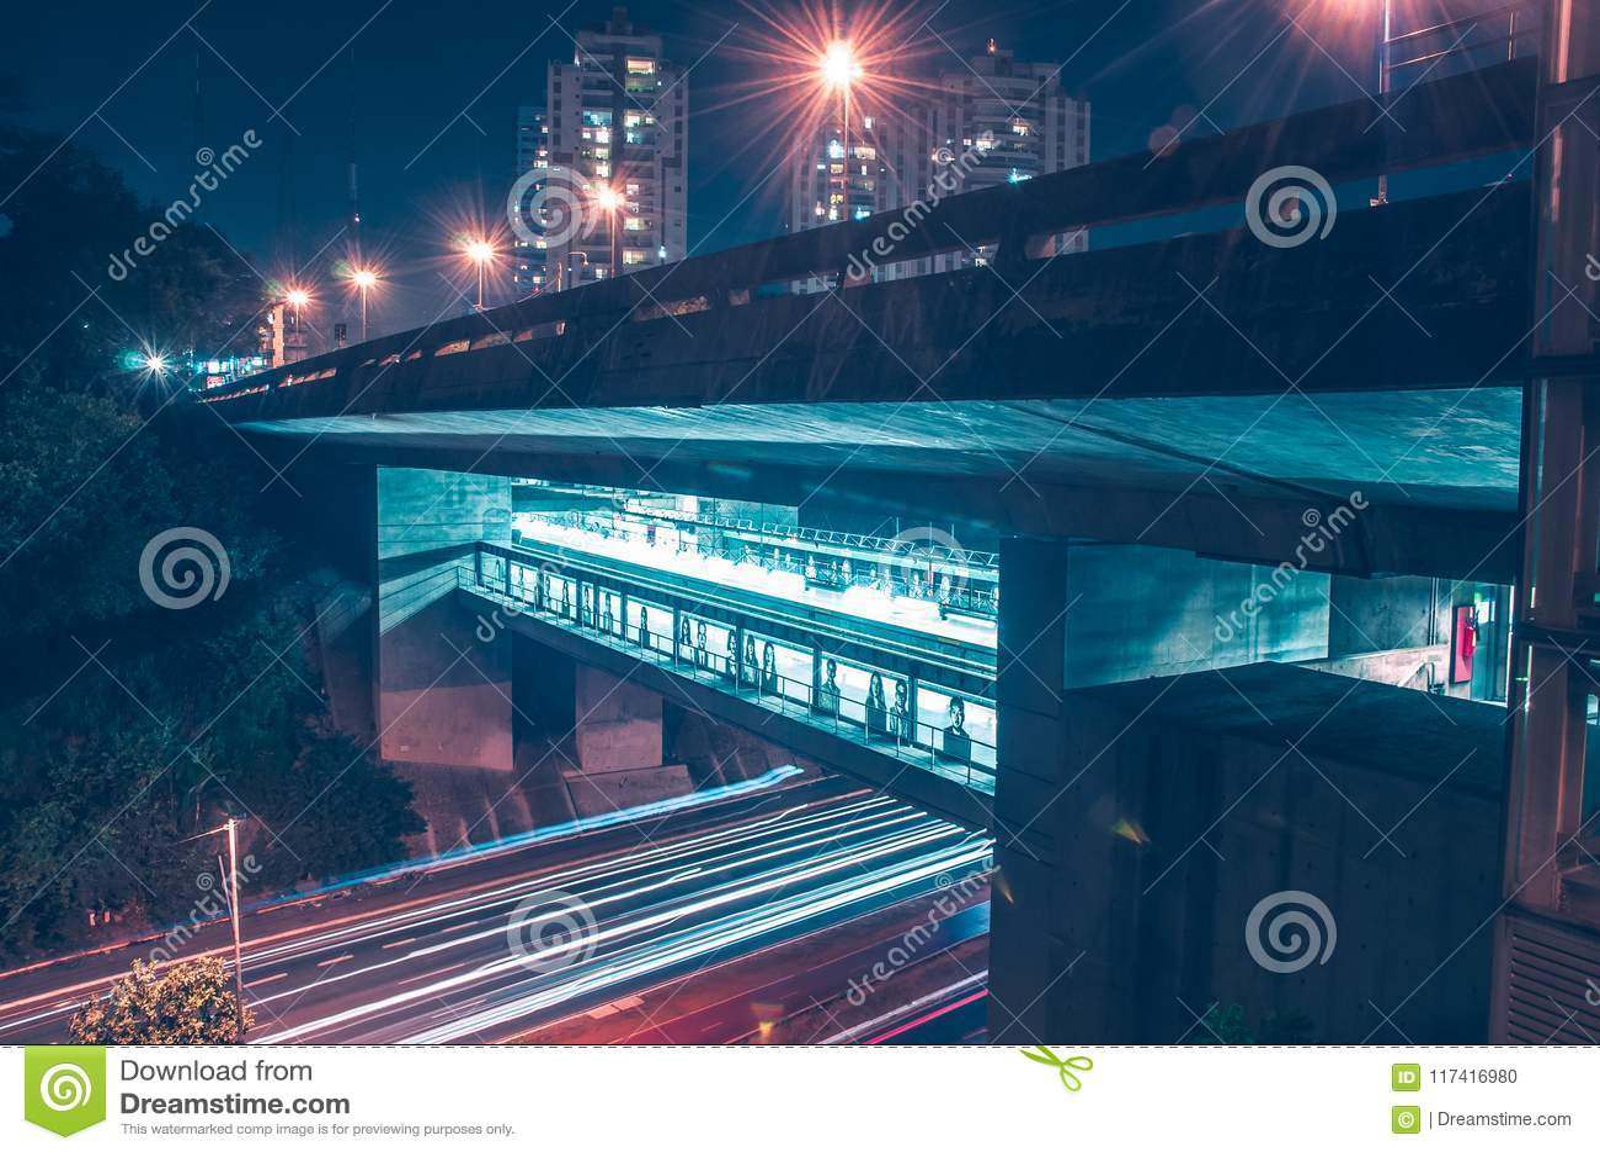 Bridge illuminated in different aspects